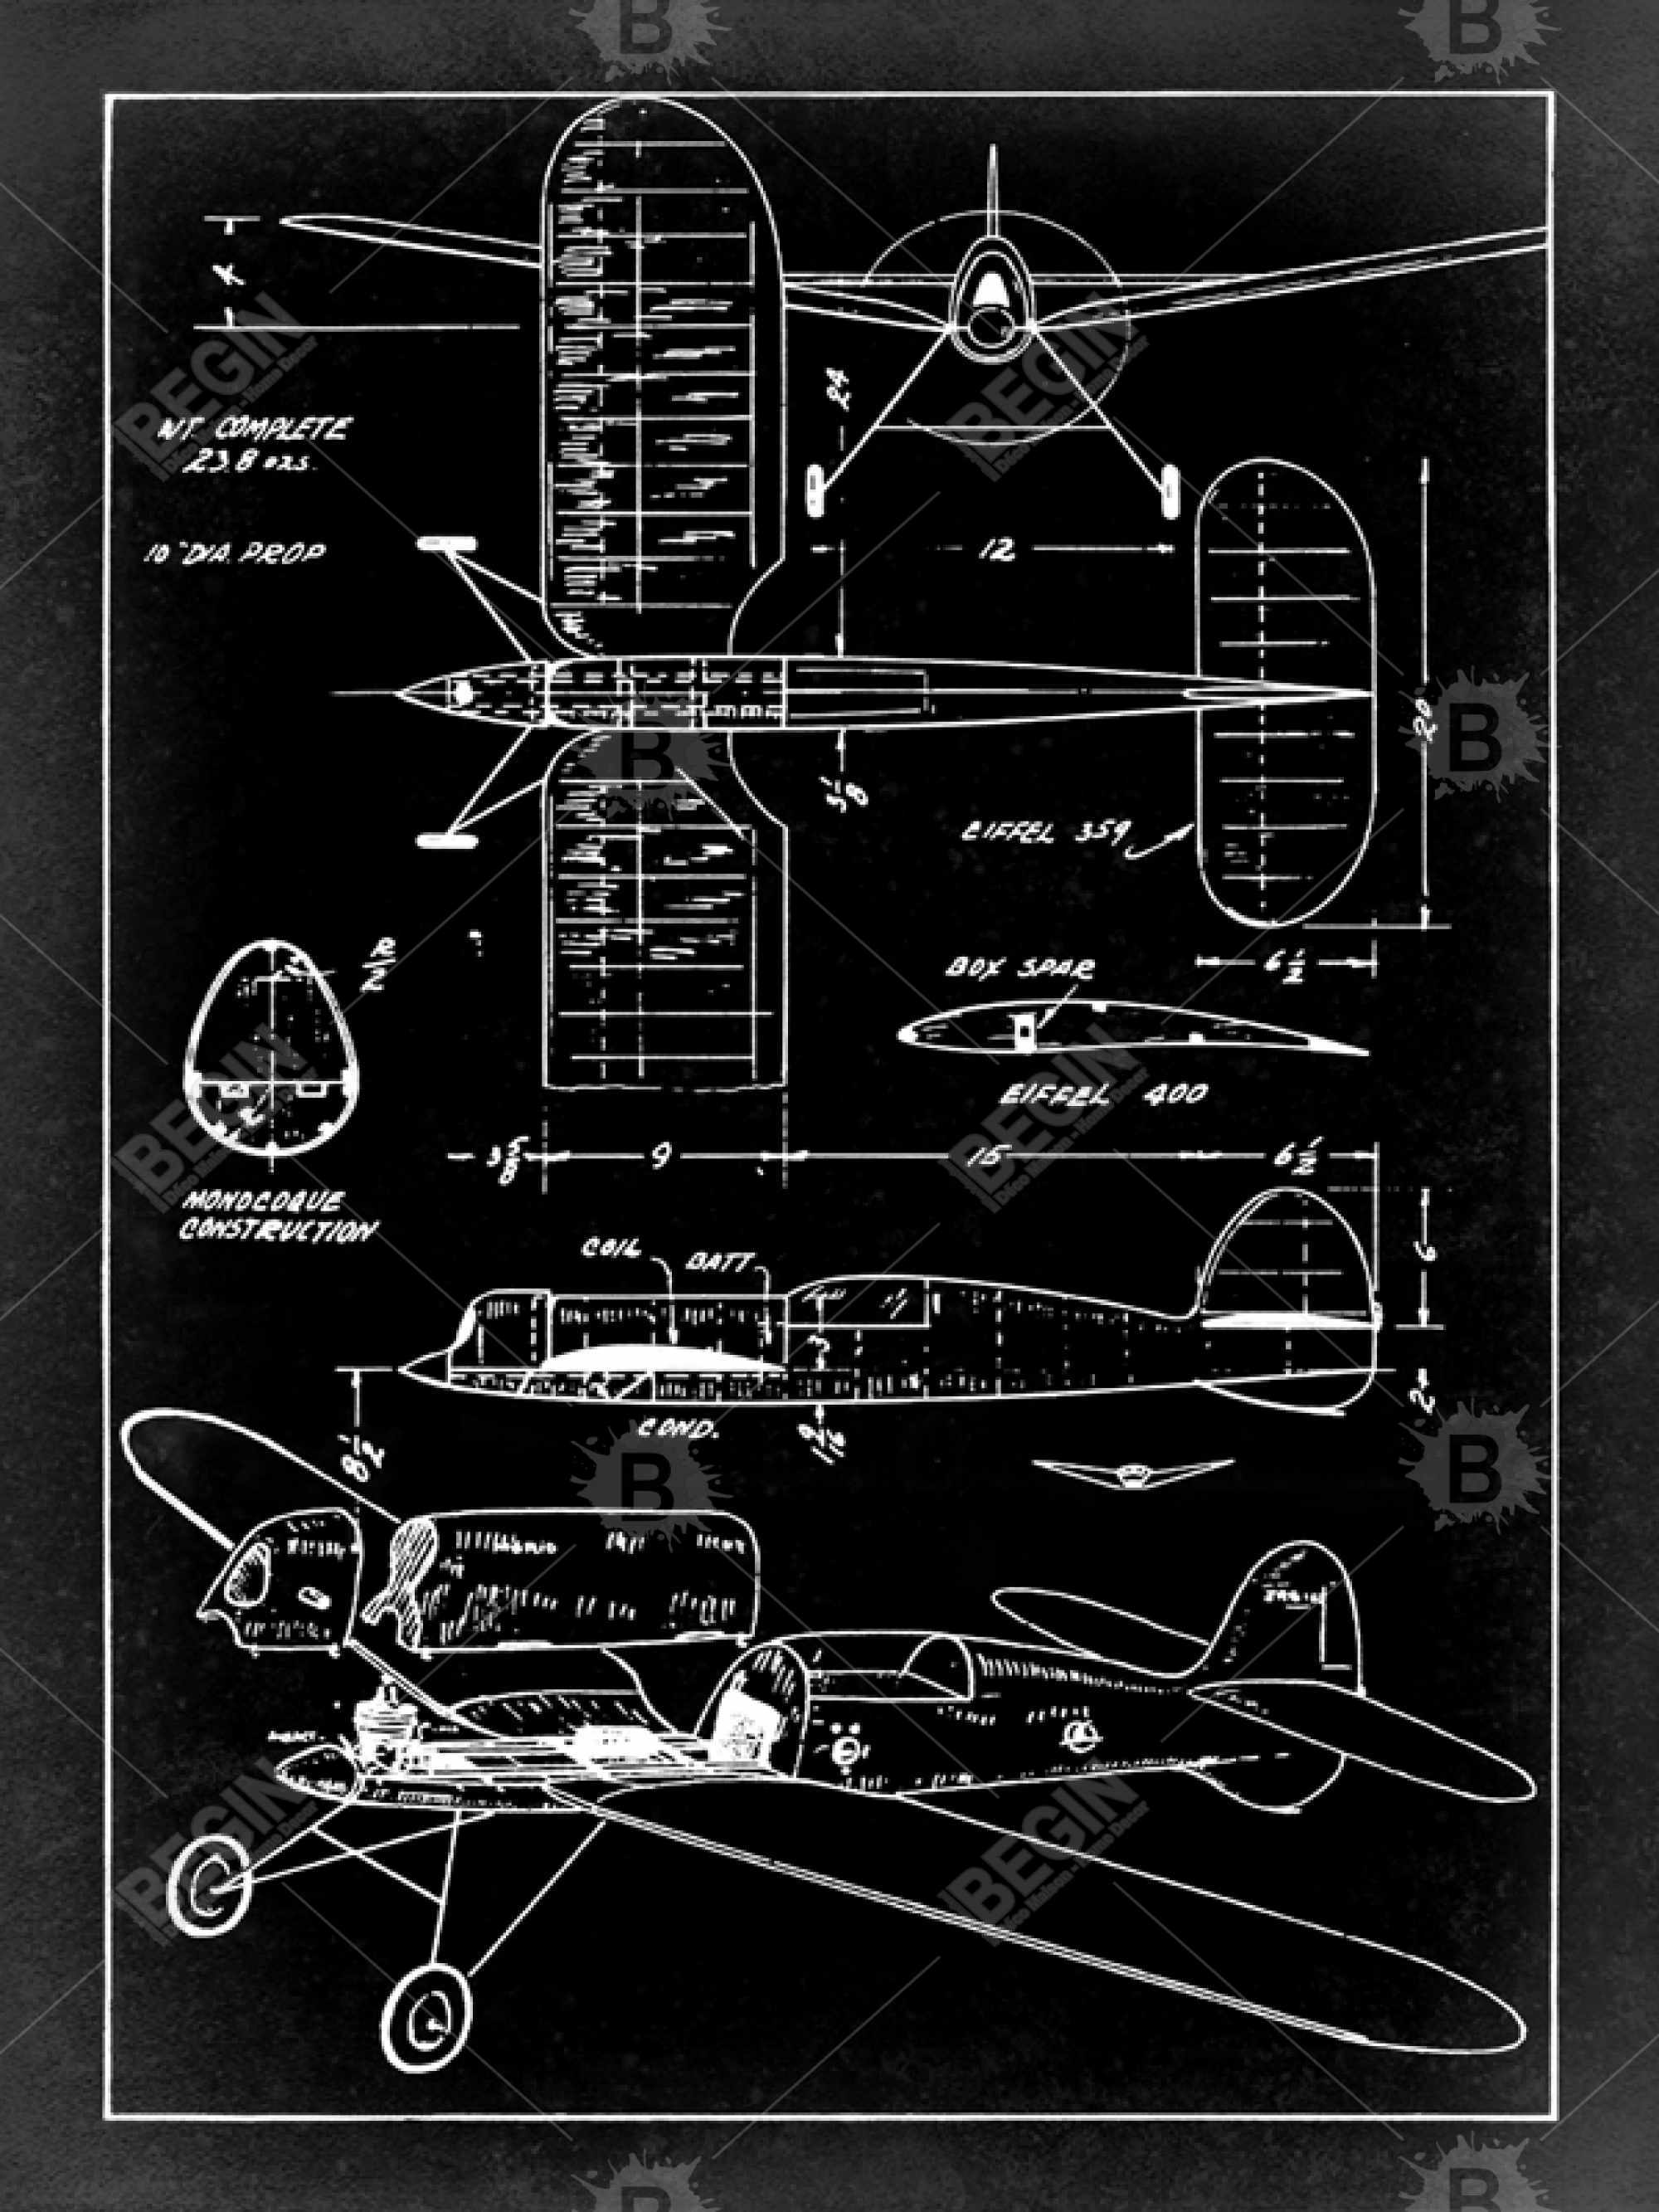 Plan d'avion